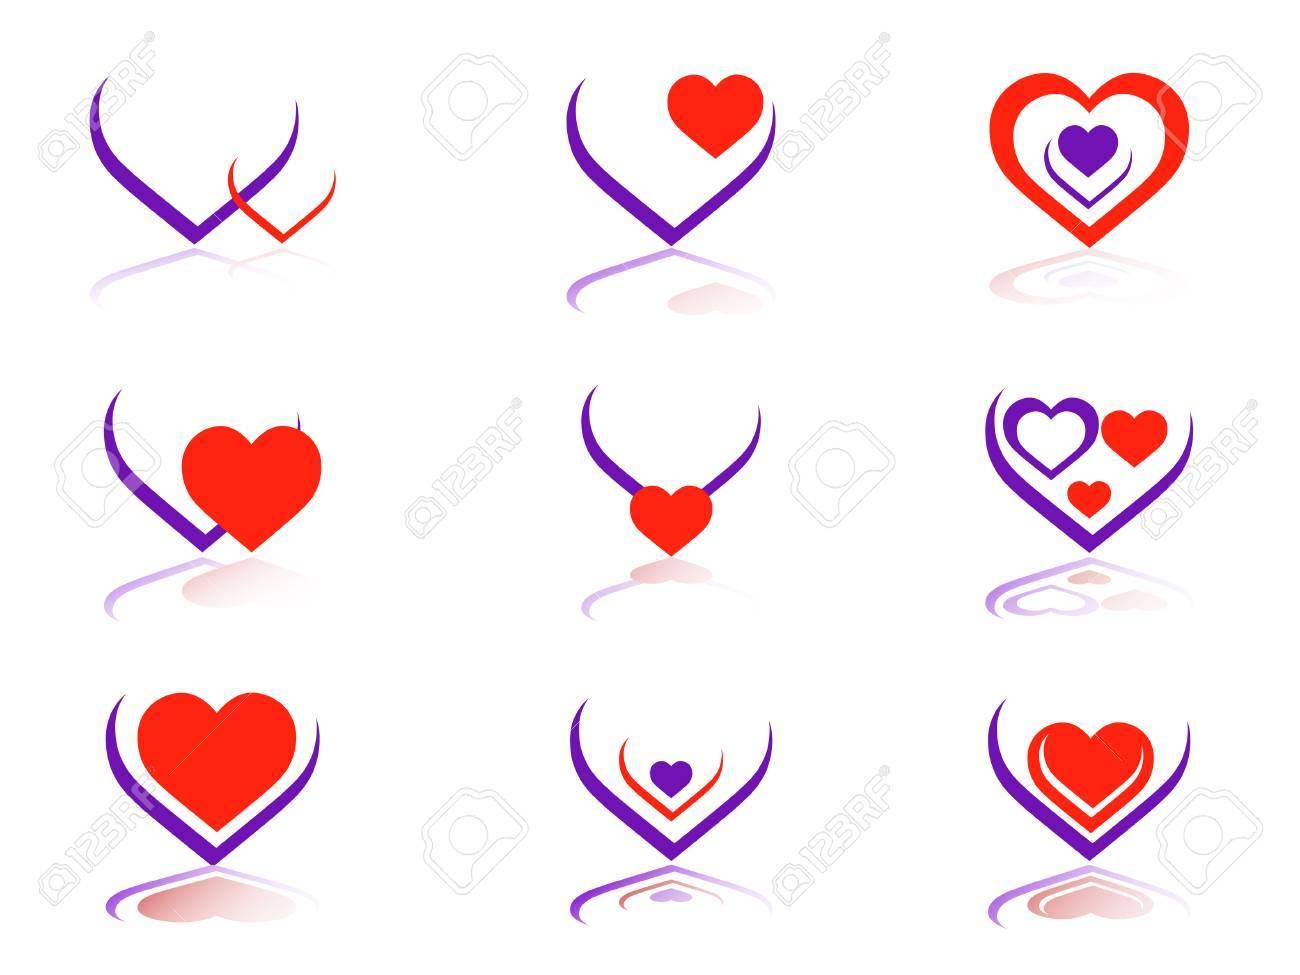 Vector illustration-9 Vector heart icons Stock Vector - 3249349